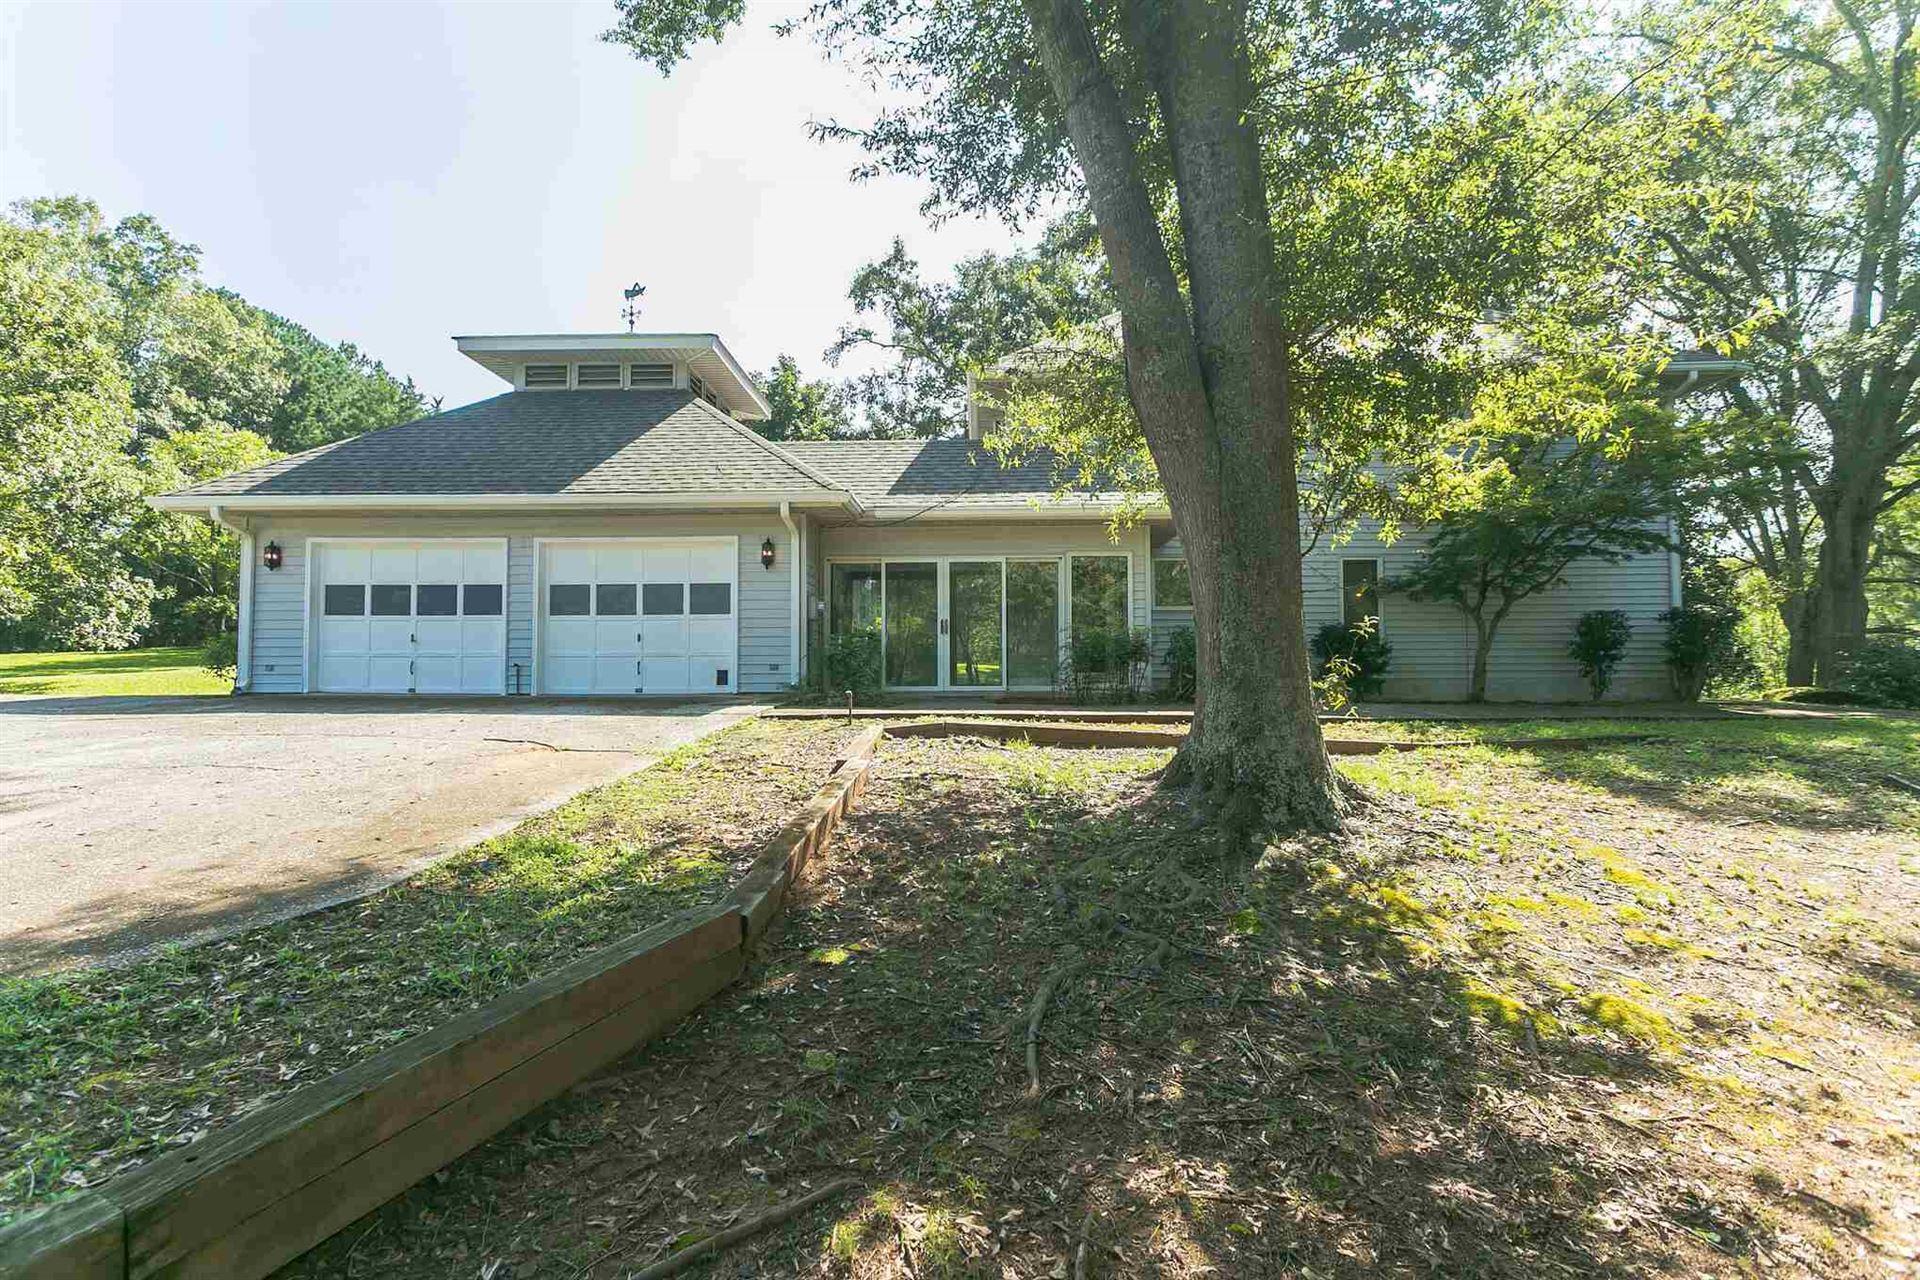 8125 Cochran Mill Rd, Chattahoochee Hills, GA 30268 - MLS#: 8857474